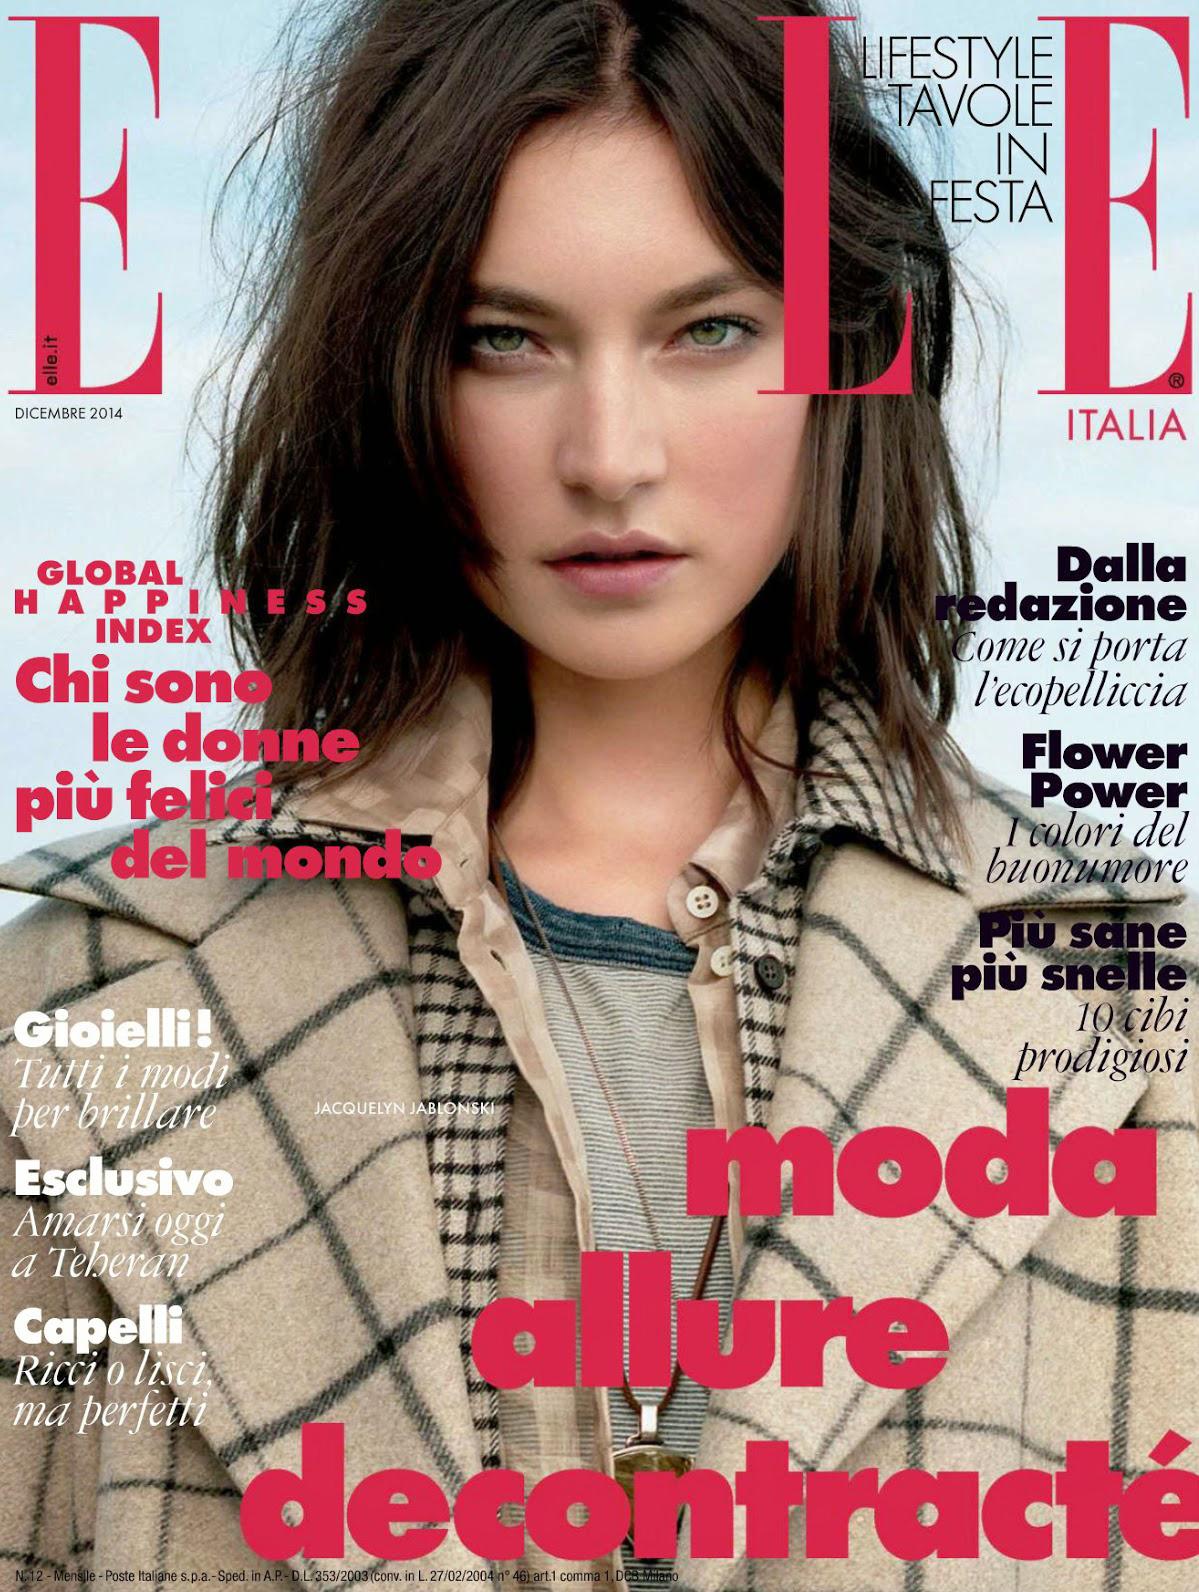 http://az617363.vo.msecnd.net/cmsroot/imgmodels/media/content/news/jacquelynj_elleitalia_dec14/jacquelyn-jablonski-elle-magazine,-italia,-december-2014-1_1.jpg?width=1199&height=1592&ext=.jpg